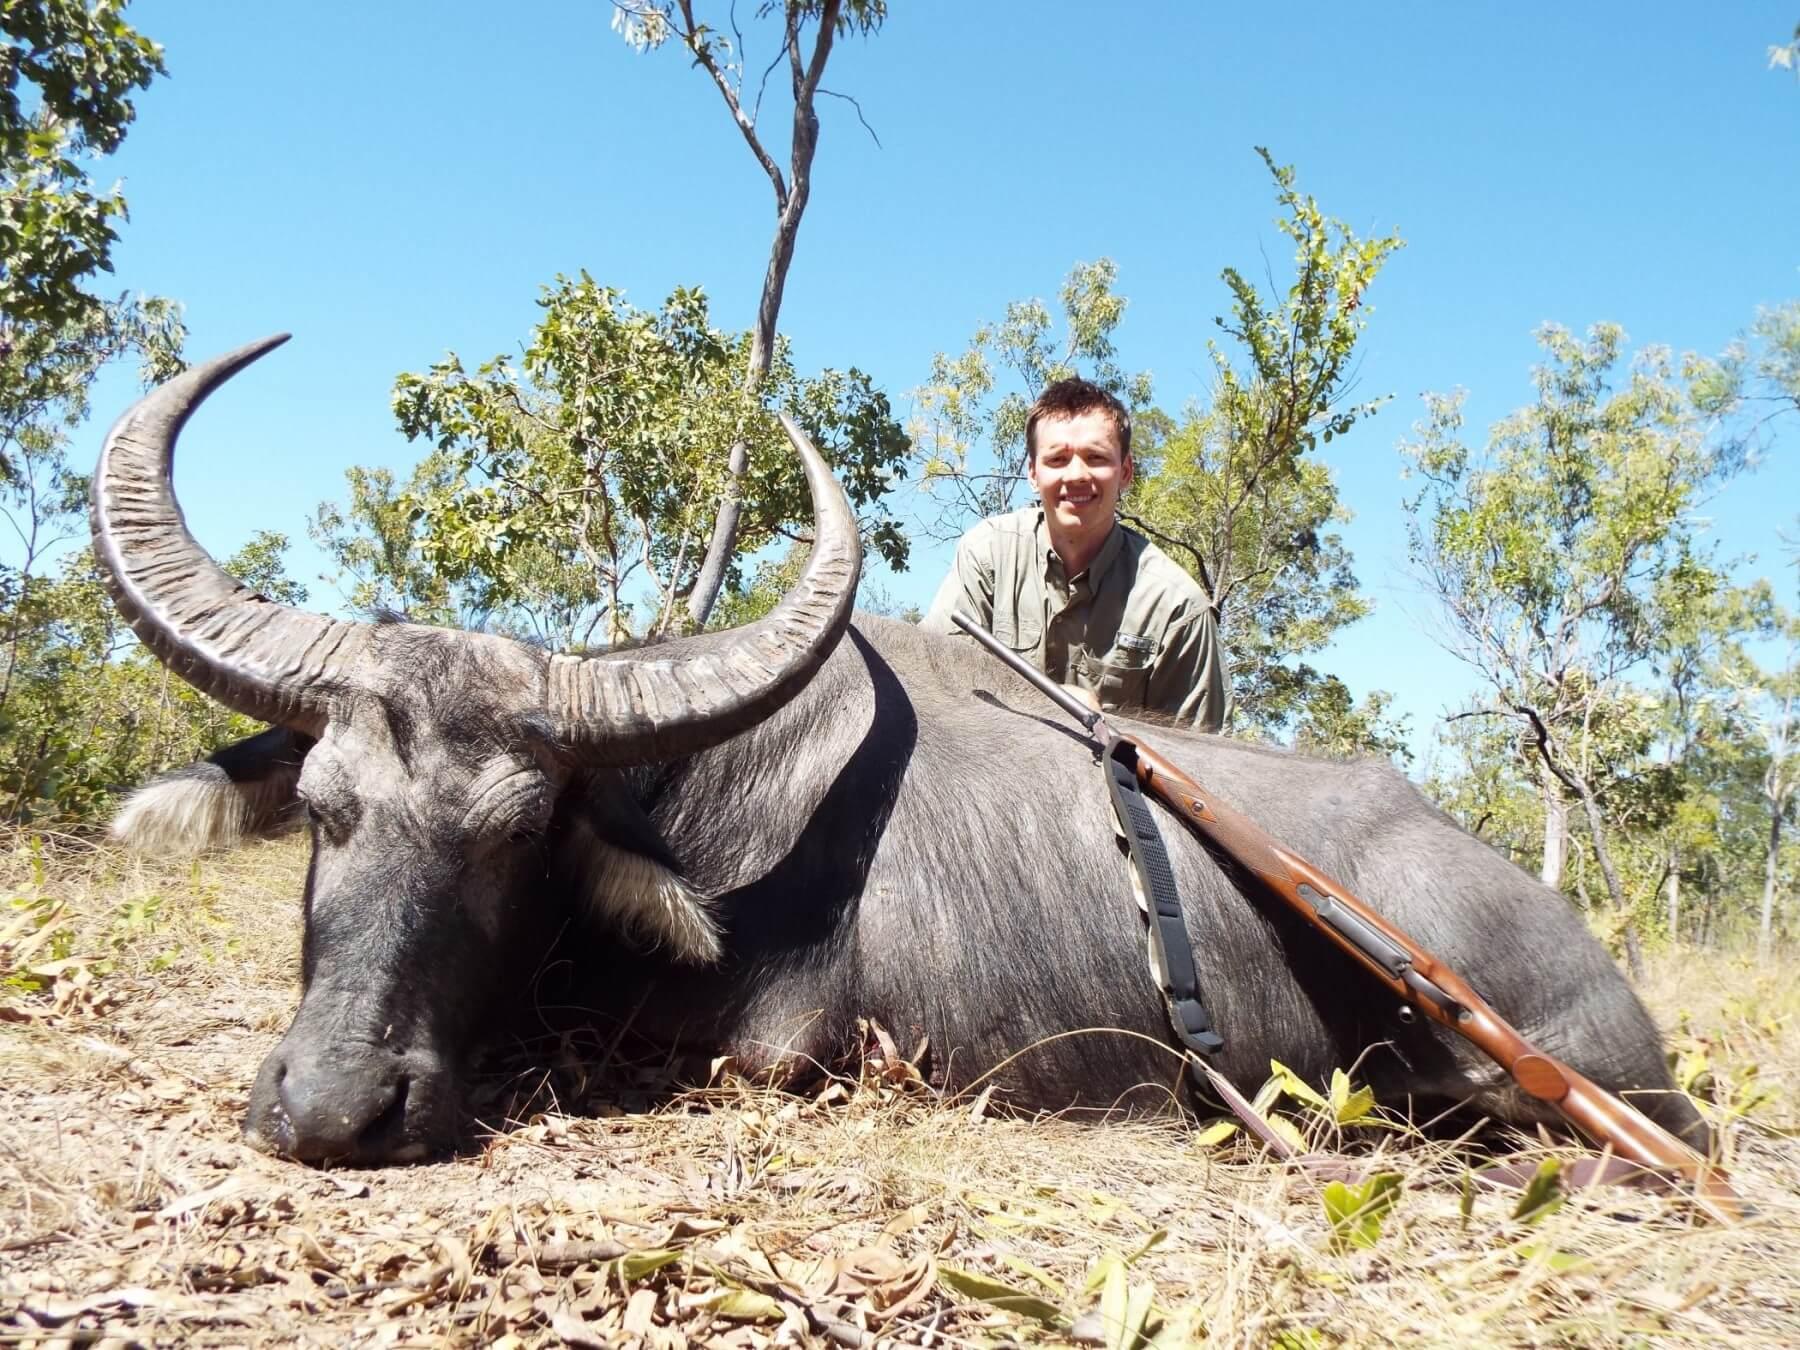 Hunting-guides-Australia.jpg